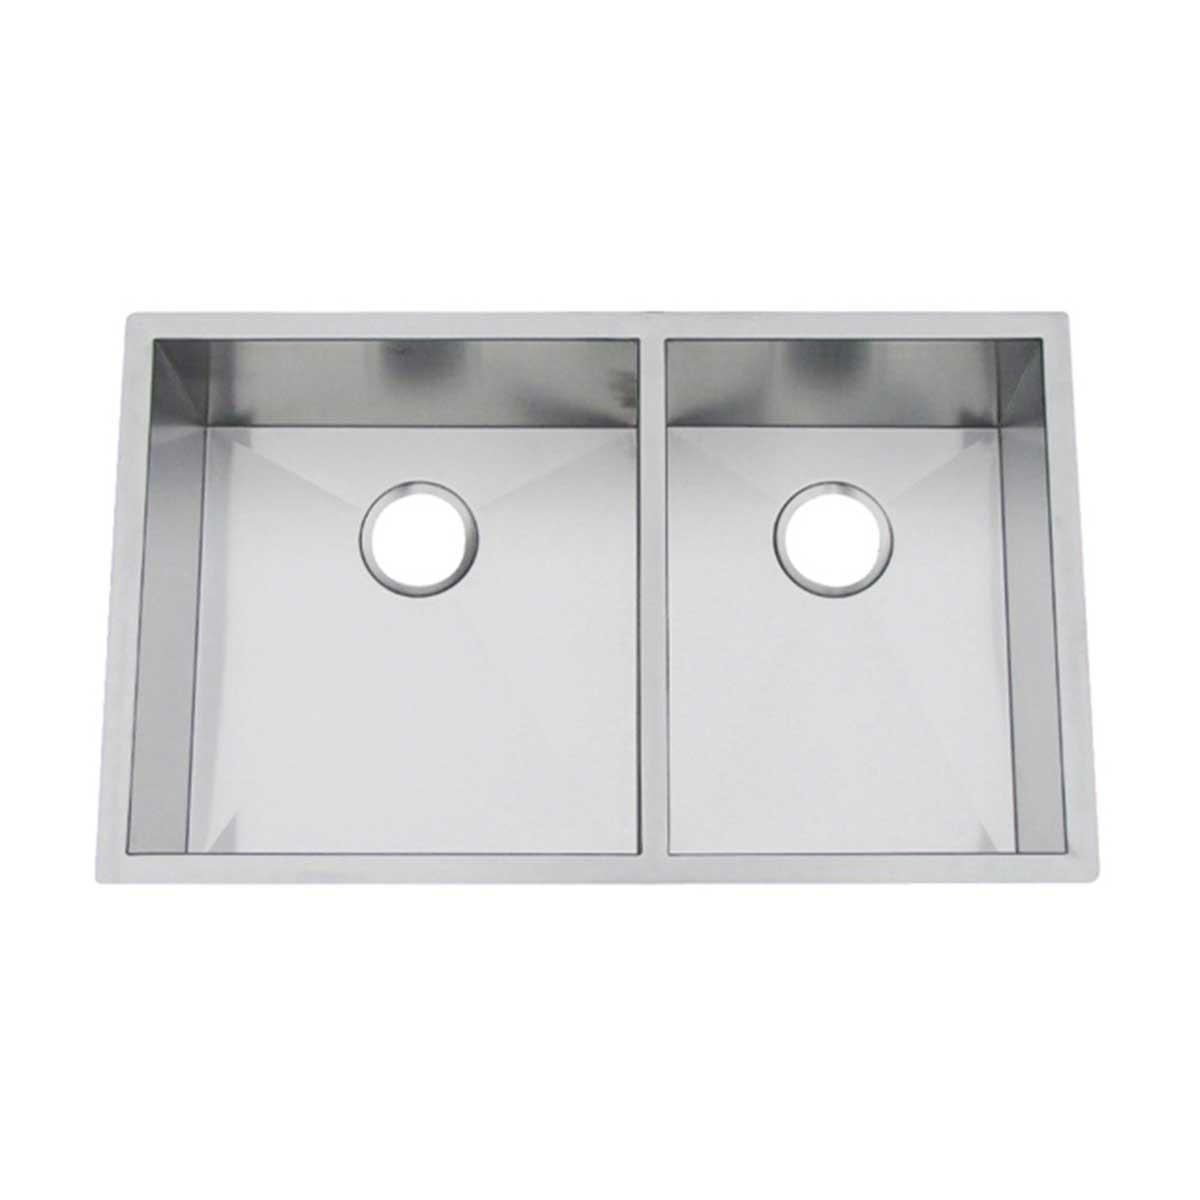 CPUZ3319-D1010 Artisan sink